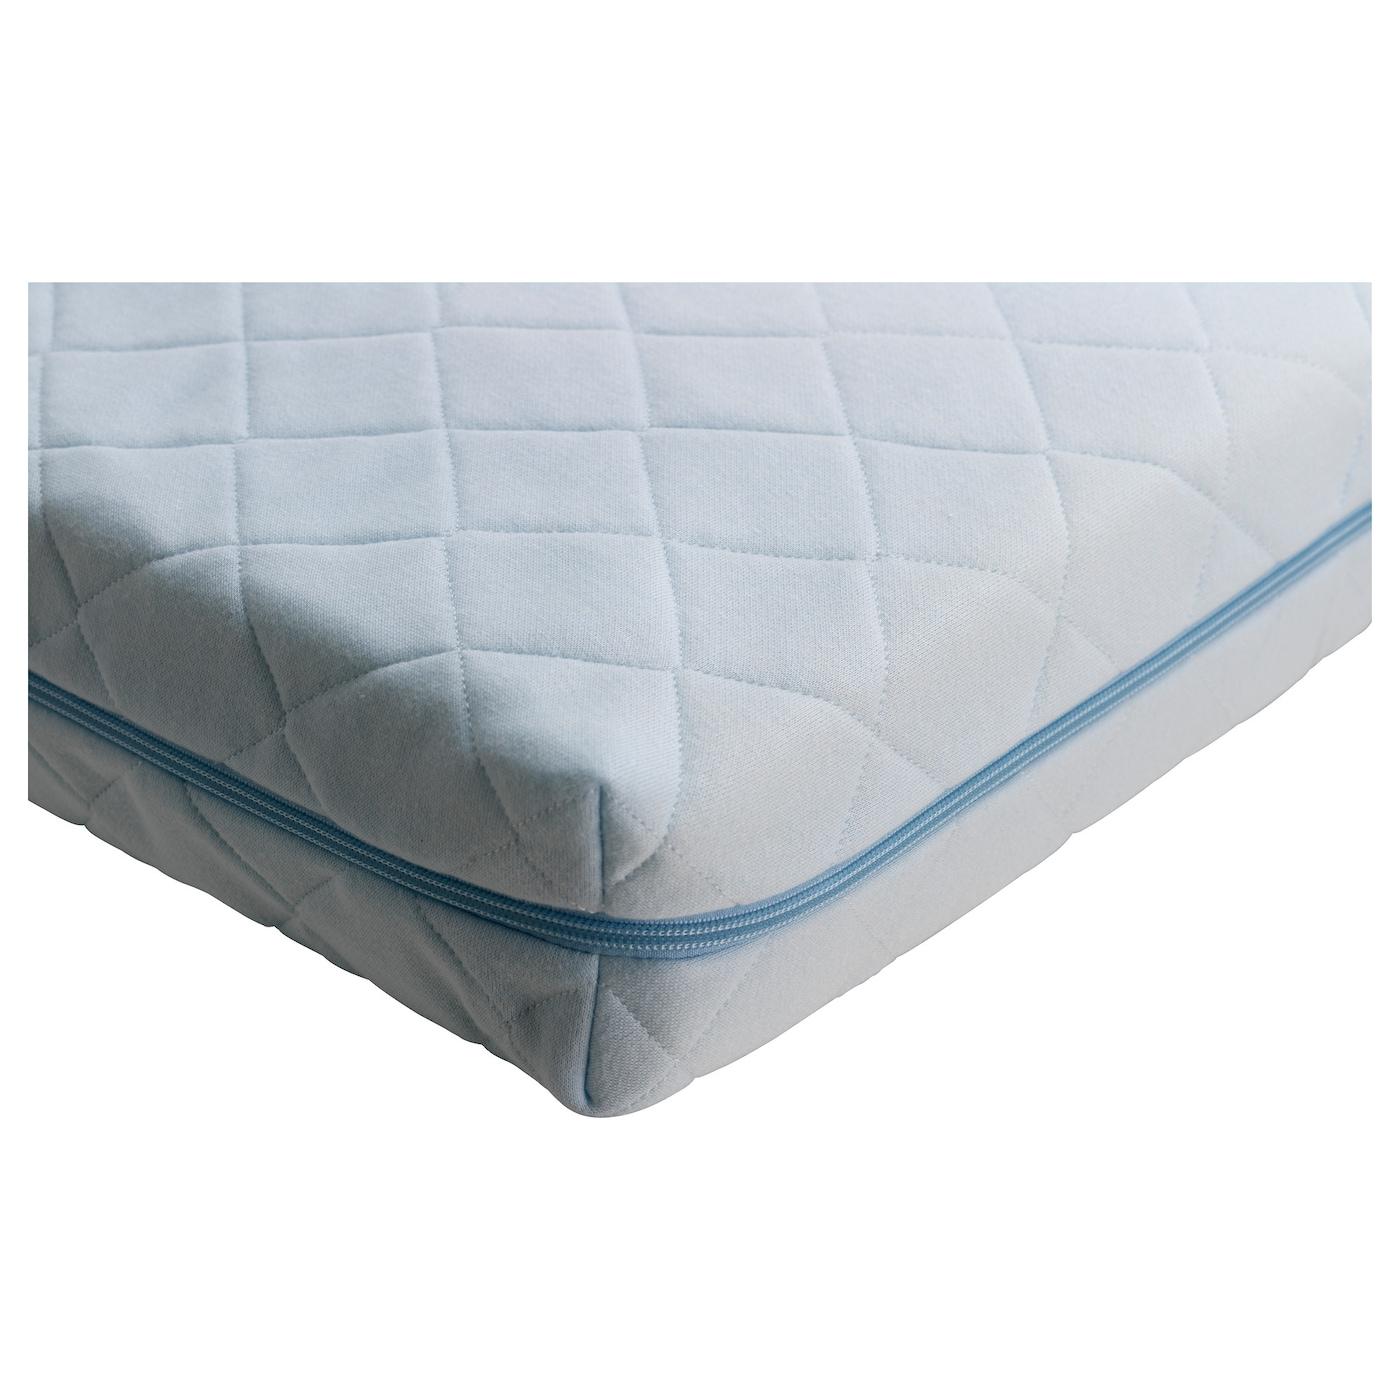 vyssa vinka mattress for cot blue 60x120 cm ikea. Black Bedroom Furniture Sets. Home Design Ideas